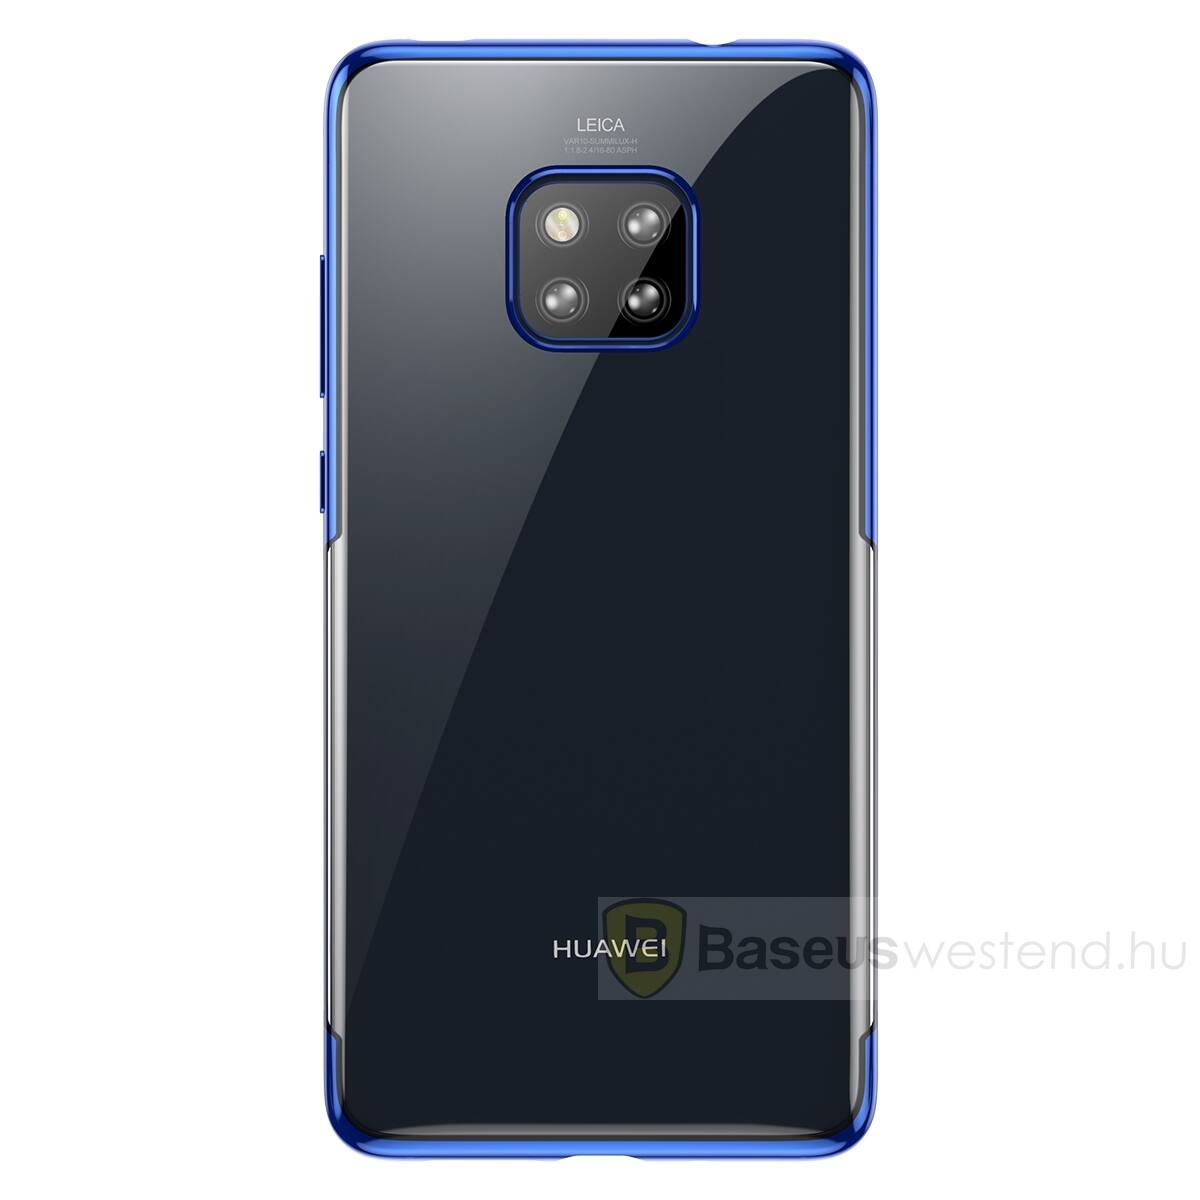 Baseus Huawei Mate 20 Pro tok, Shining, kék (ARHWMate 20P-MD03)